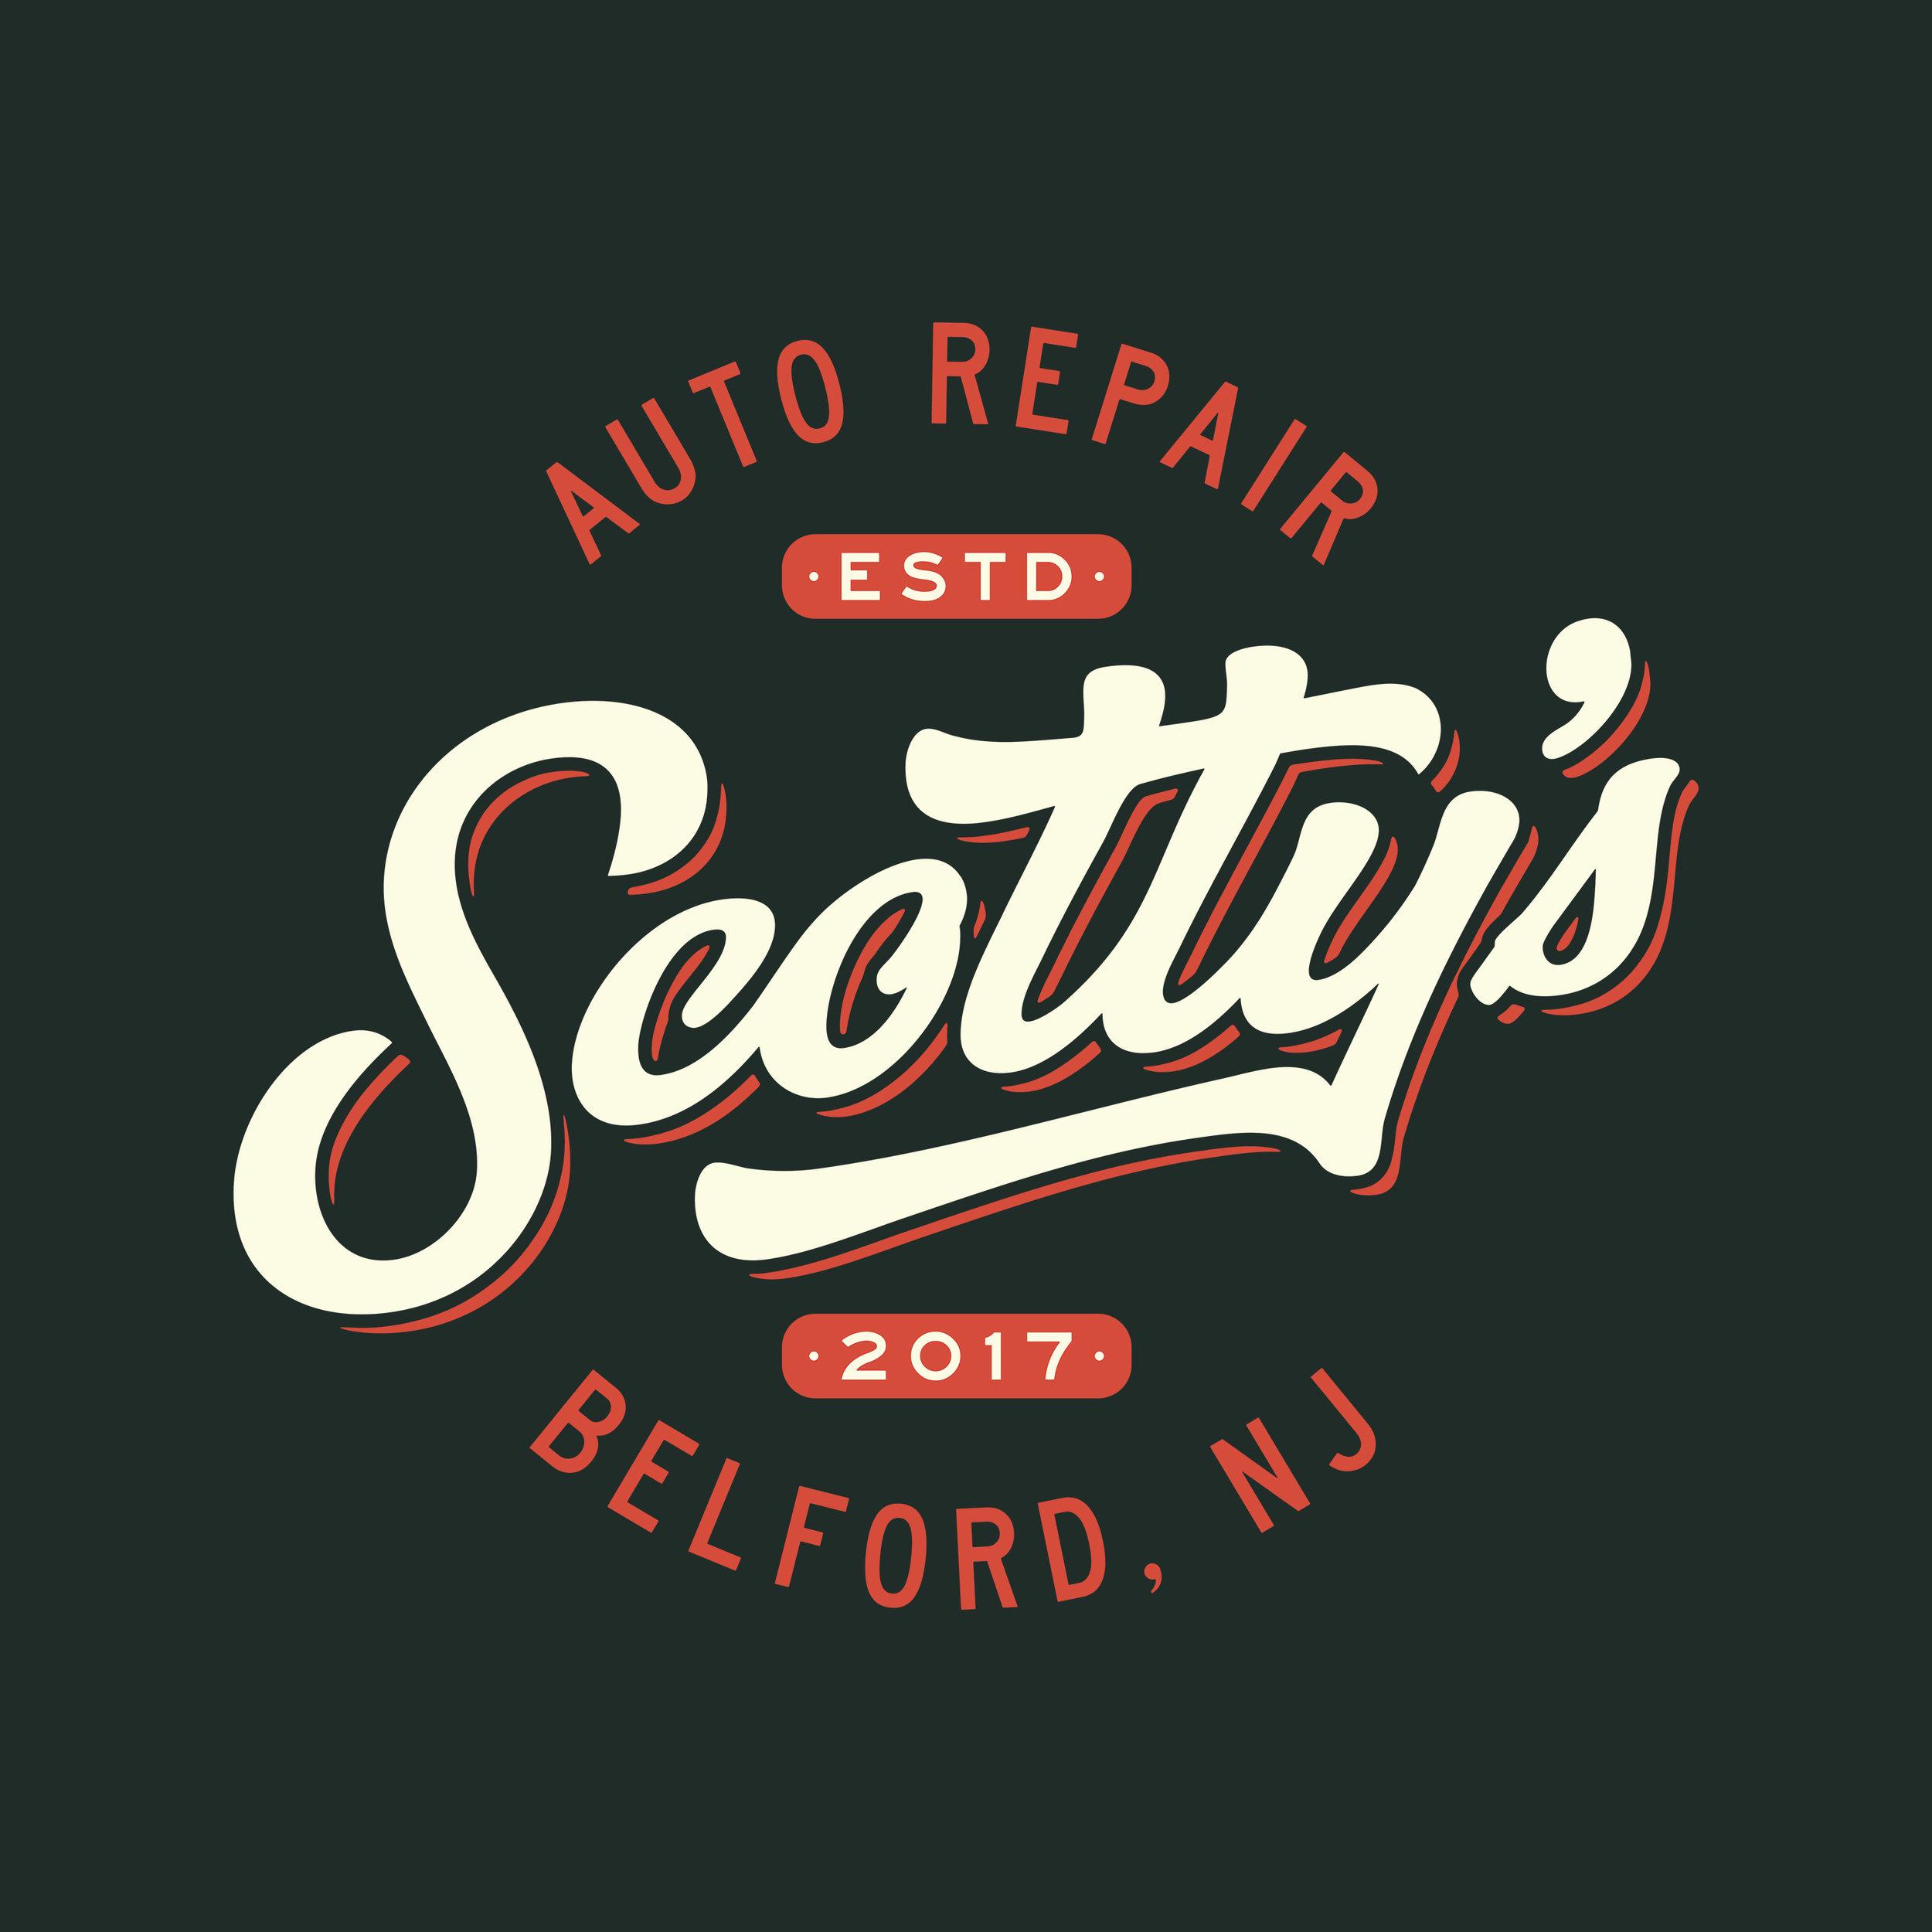 Scotty's Auto Repair - Emblem LogoAuto Repair ShopBelford, New Jersey